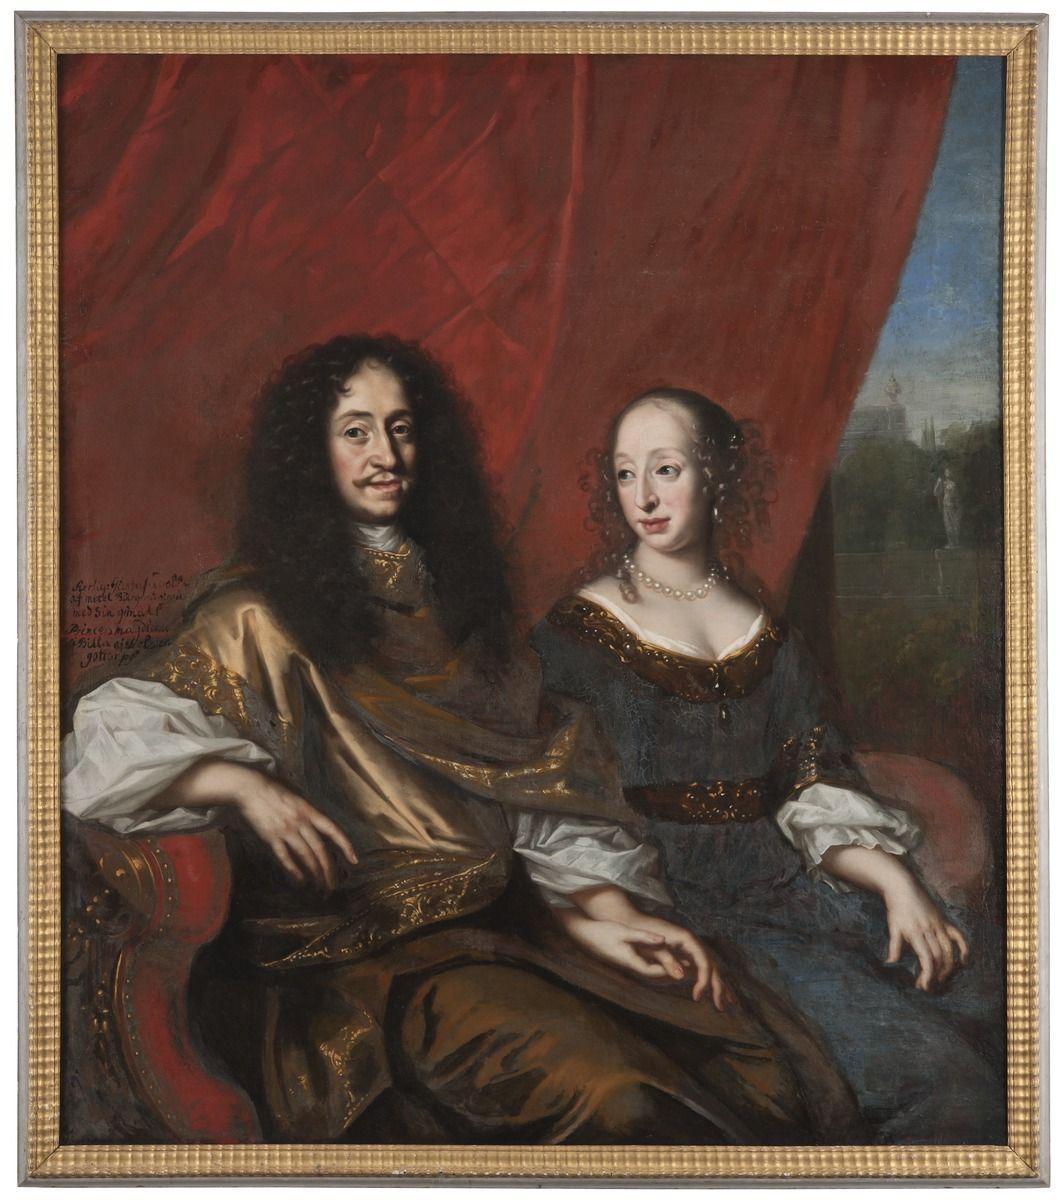 File:Gustav Adolf, 1633-1695, hertig av Mecklenburg-Güstrow. Magdalena Sibylla, 1631-1719, av Holstei - Nationalmuseum - 15541.tif